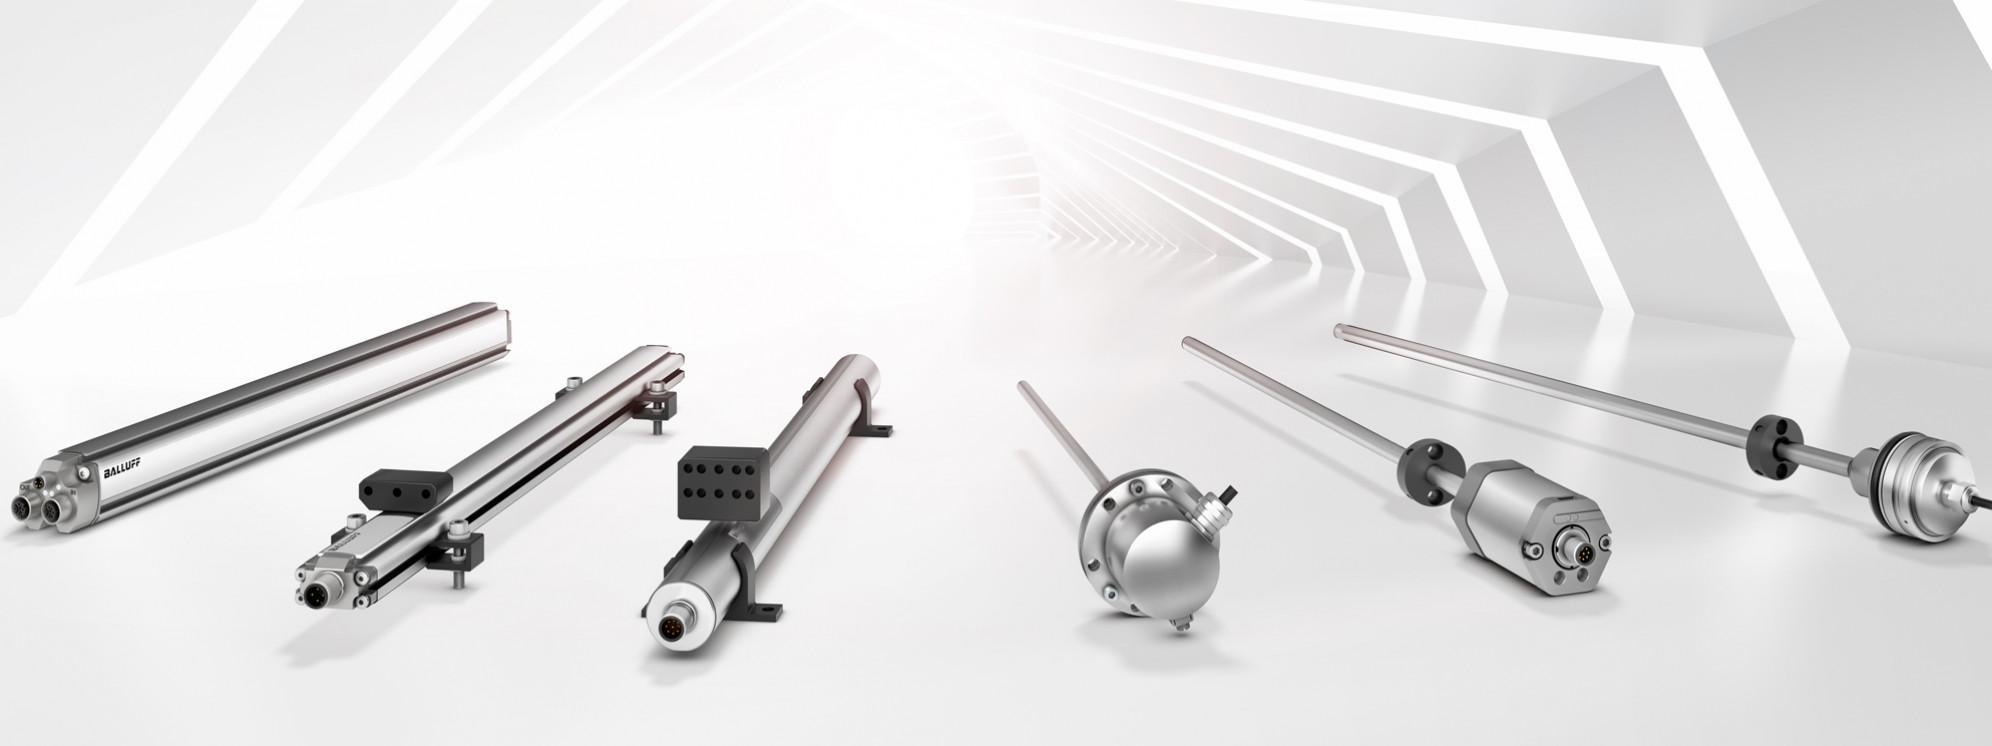 Microimpulse transducers